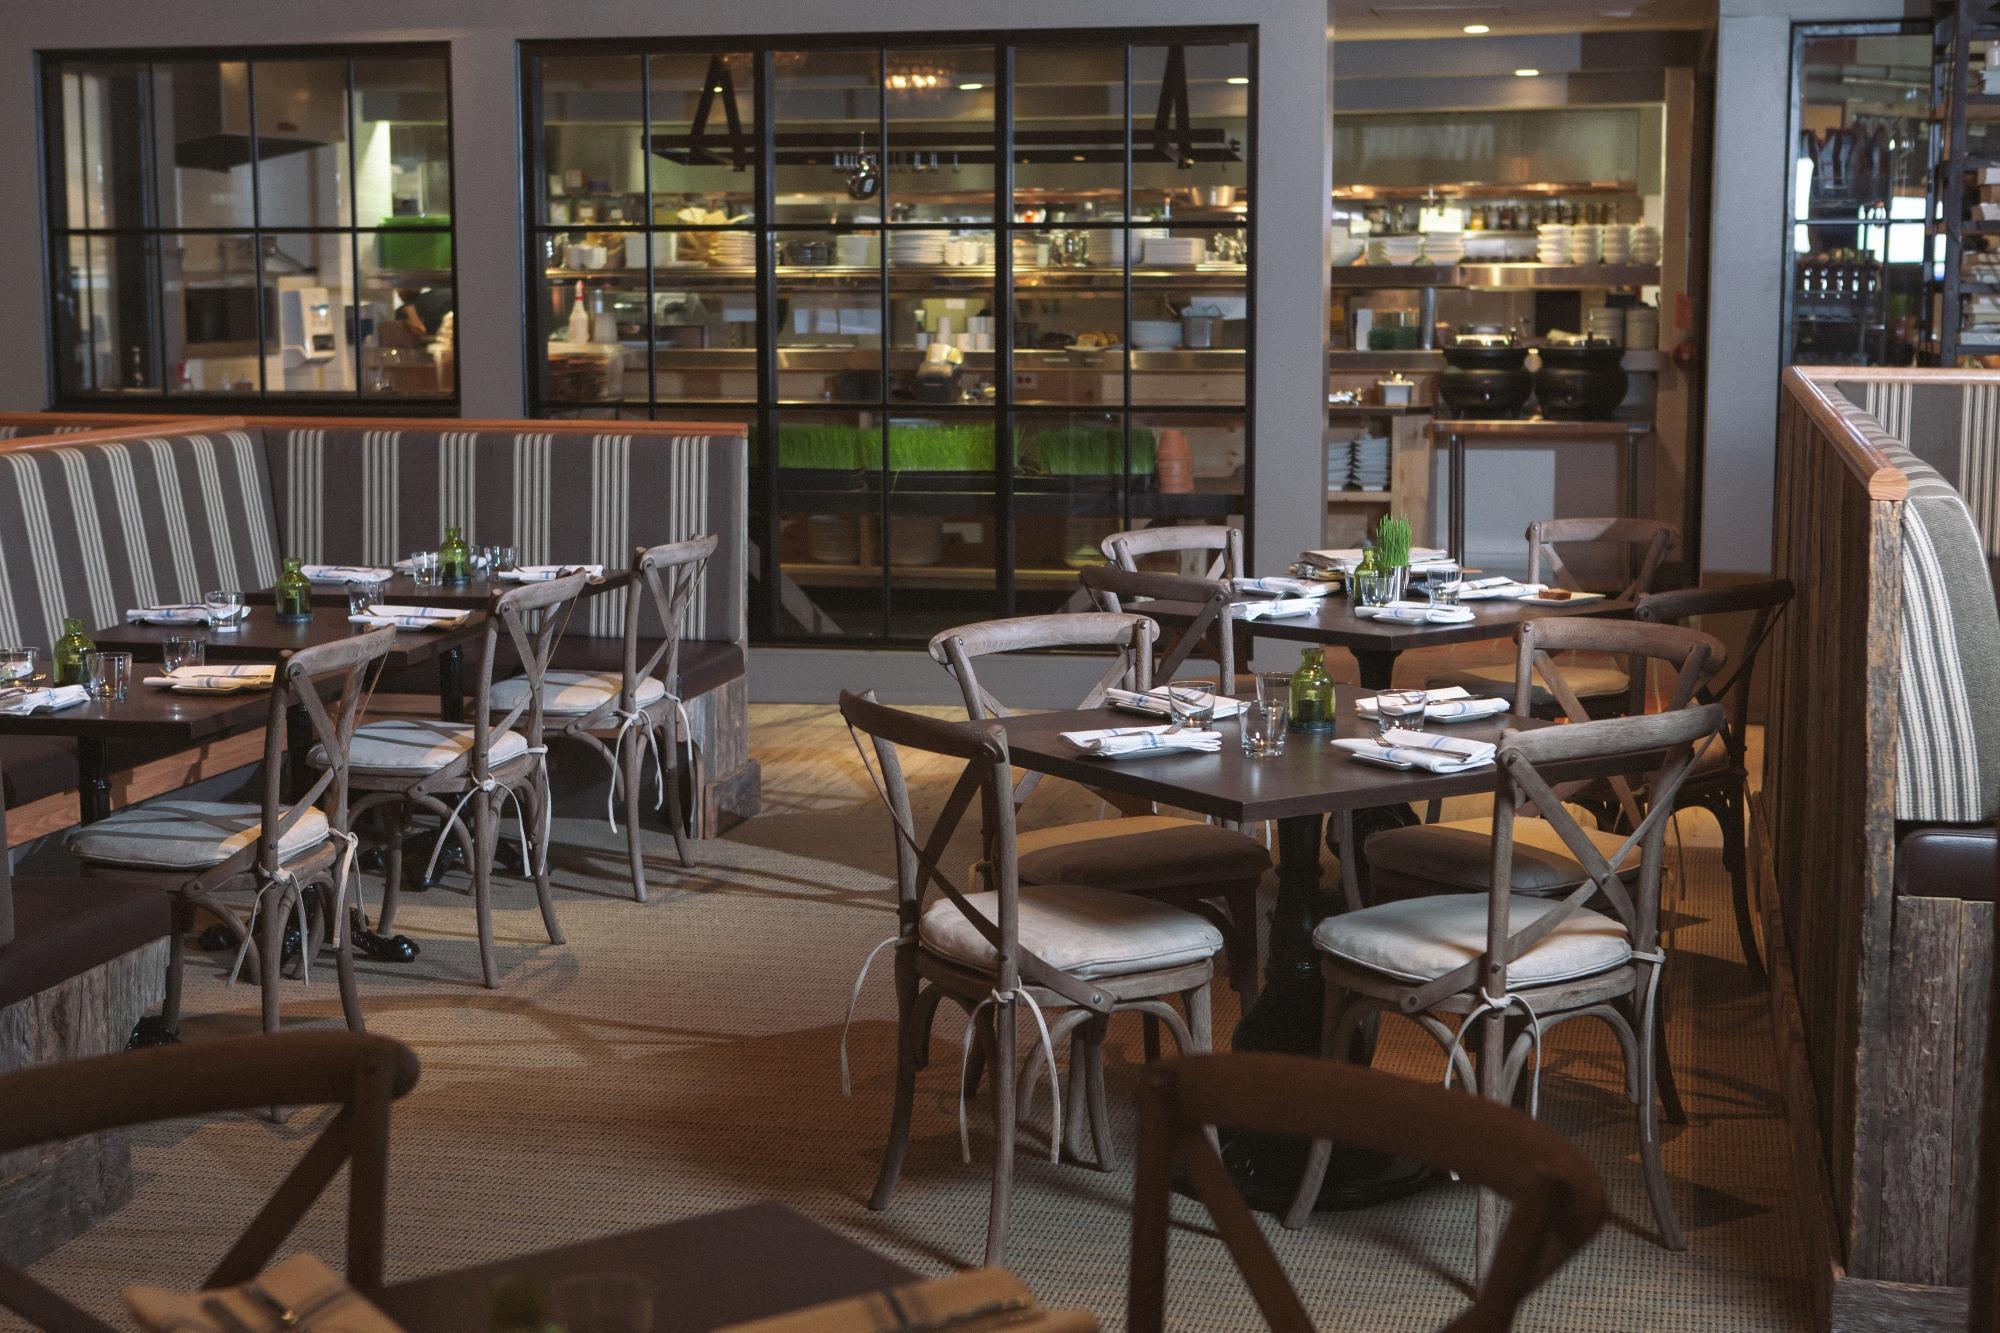 Wyndham Boca Raton FL 2017 Hotel Review